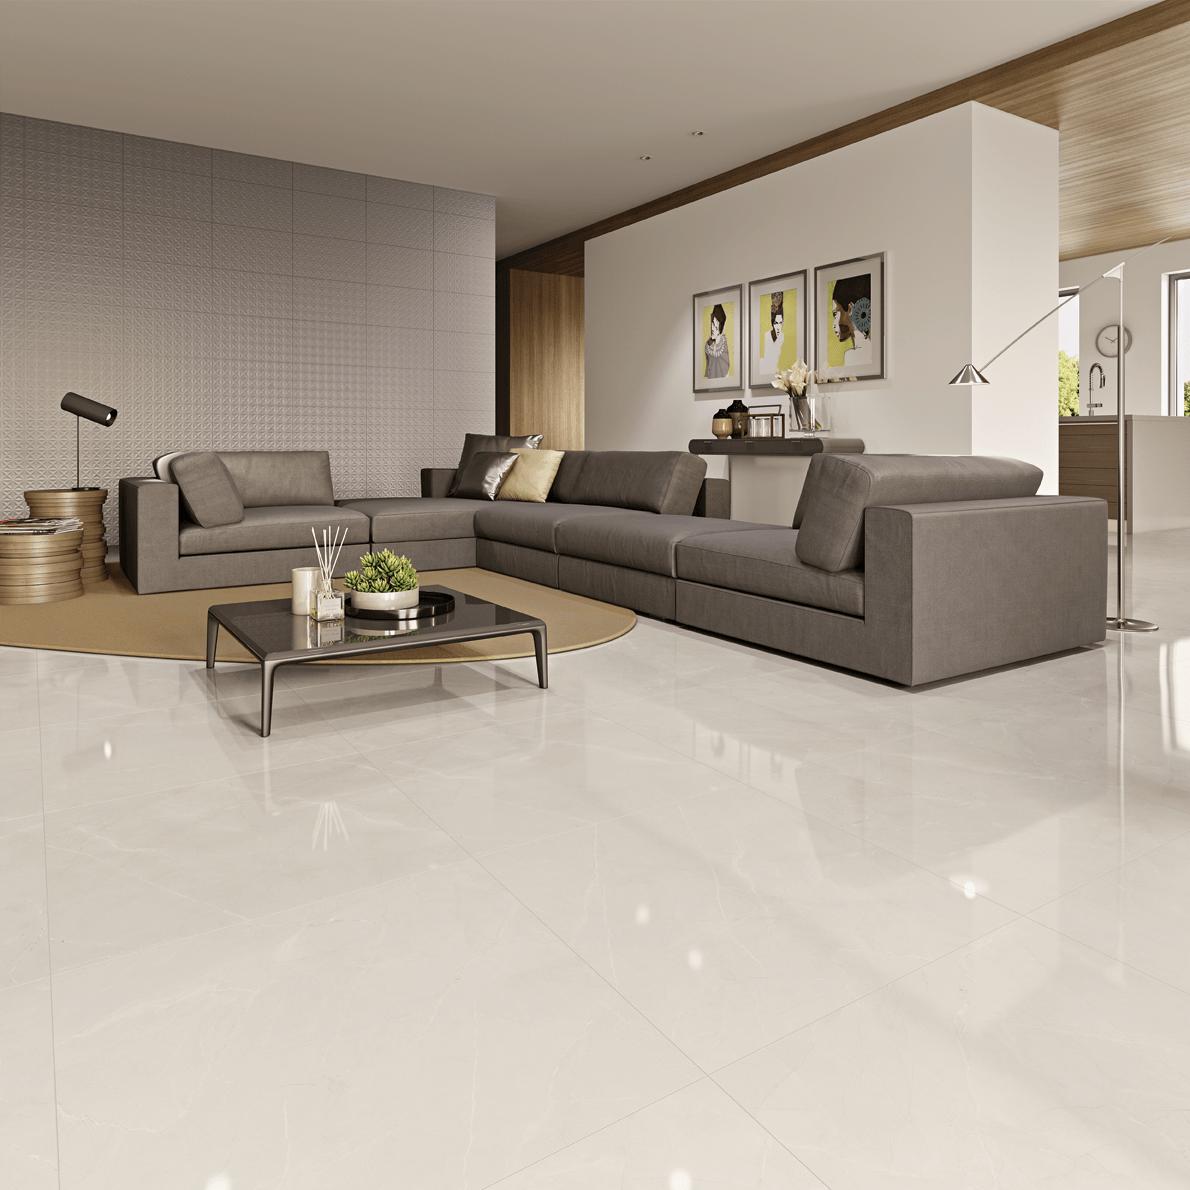 Tipos de porcelanato 60 modelos fotos ideias for Tipos de ceramicas para pisos interiores